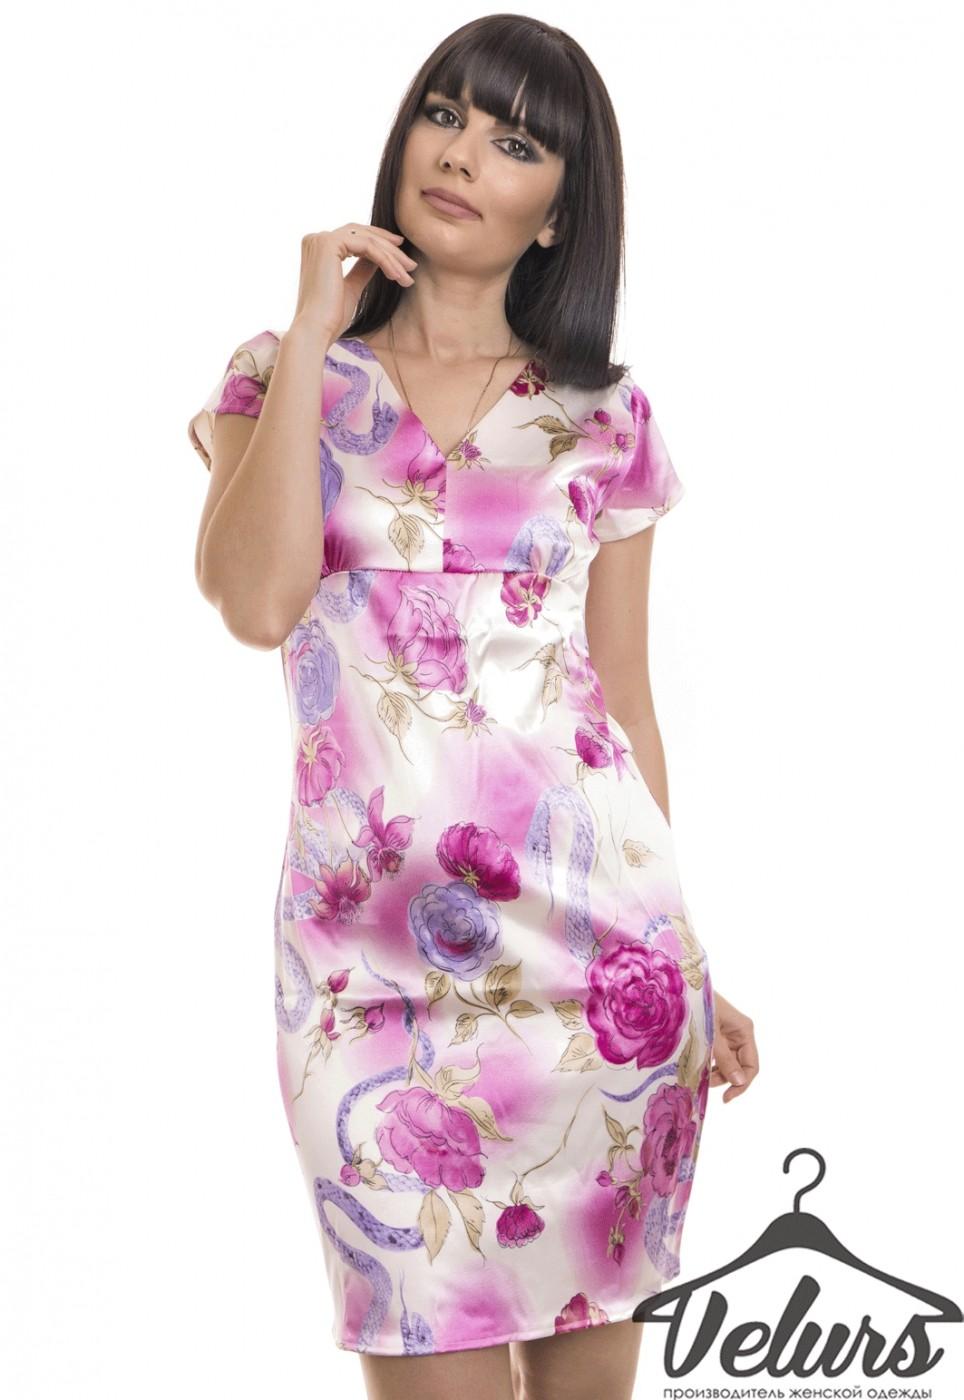 Velurs: Платье 21968 - фото 2